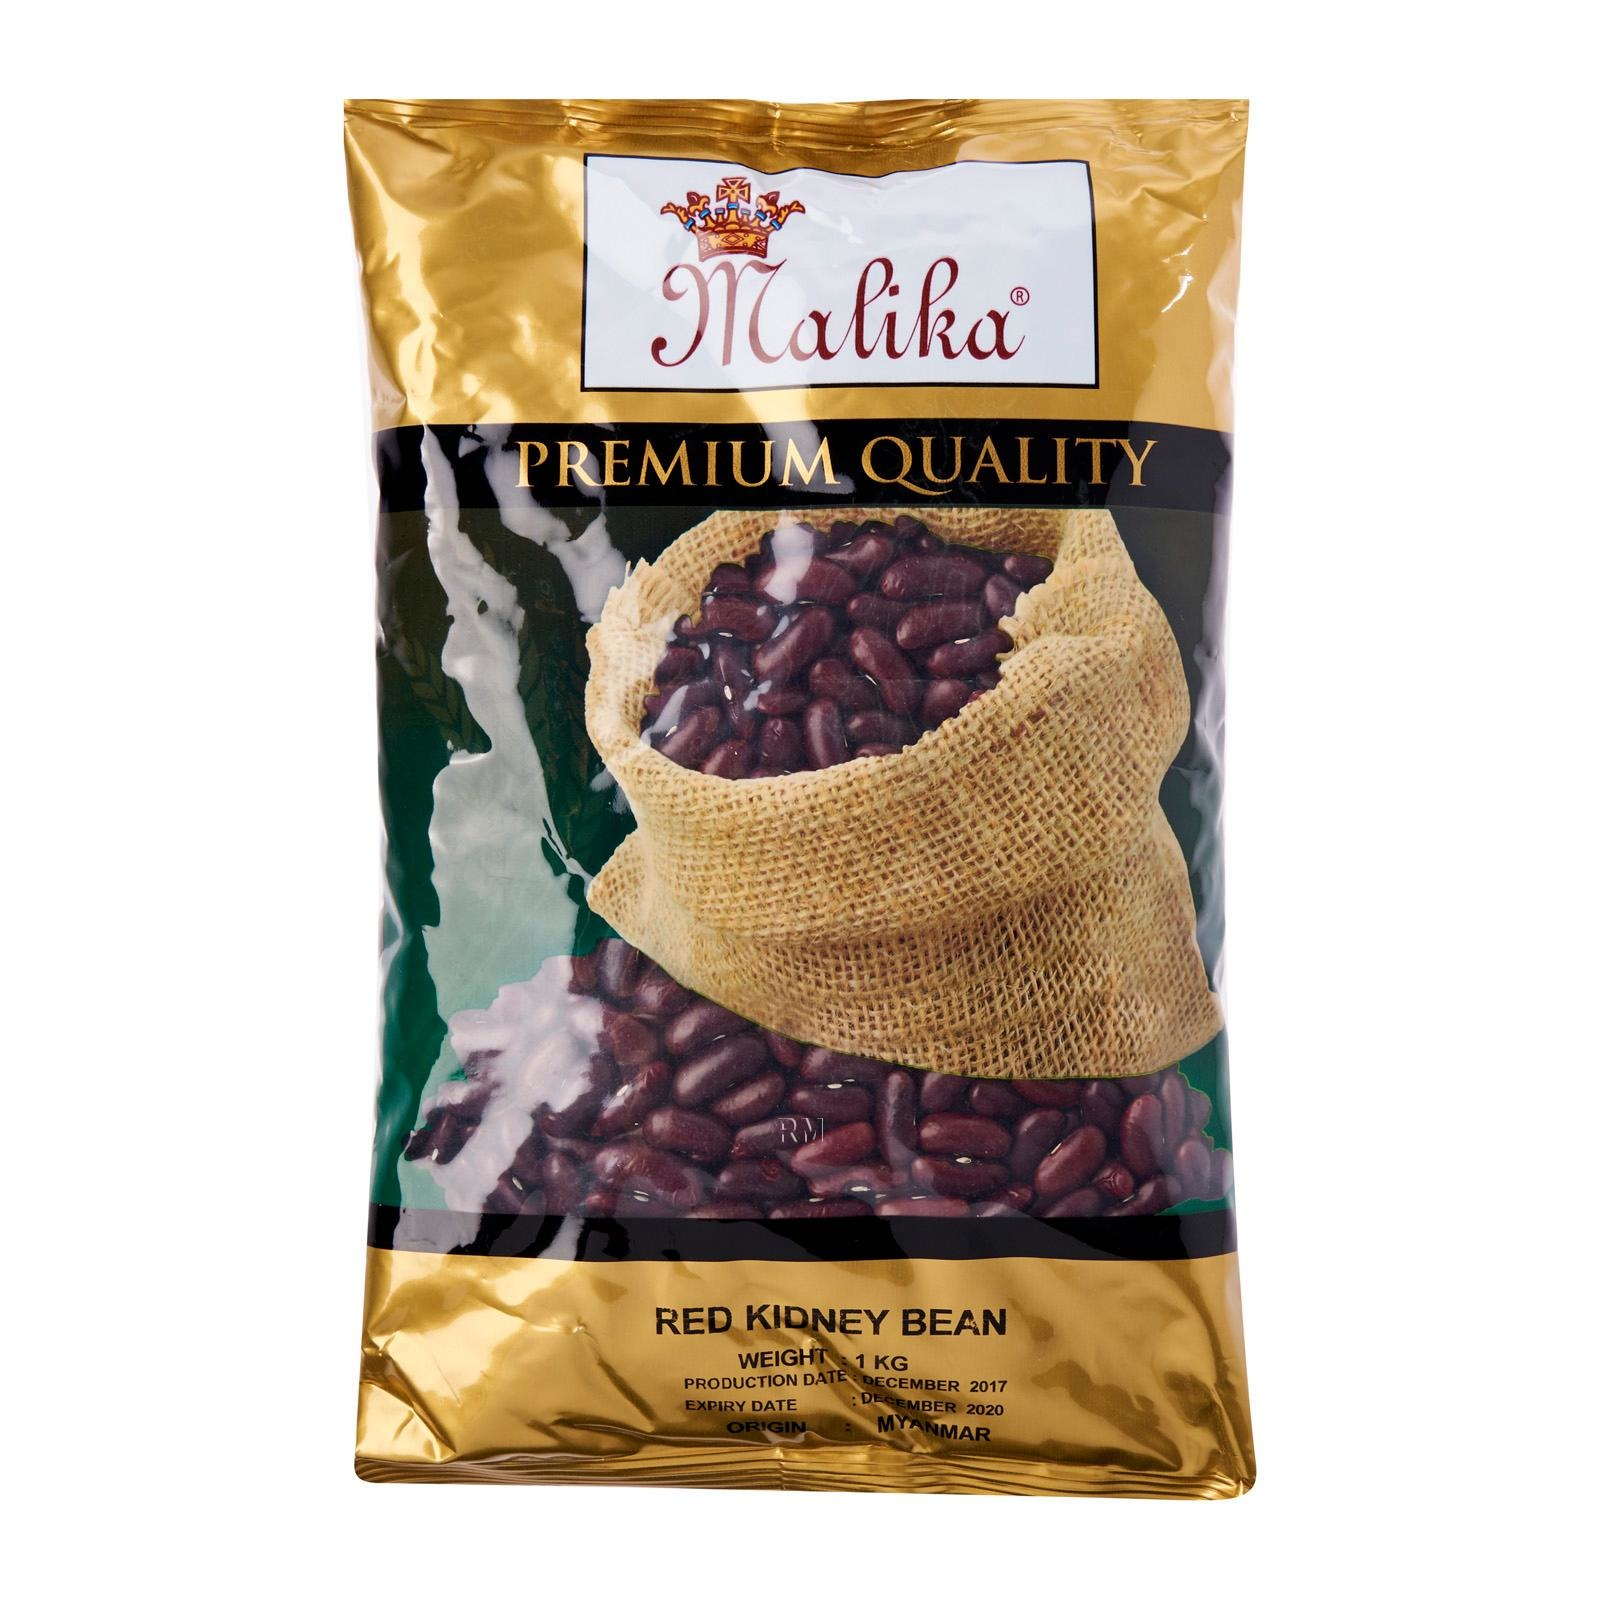 Malika Red Kidney Beans Rajma Ntuc Fairprice